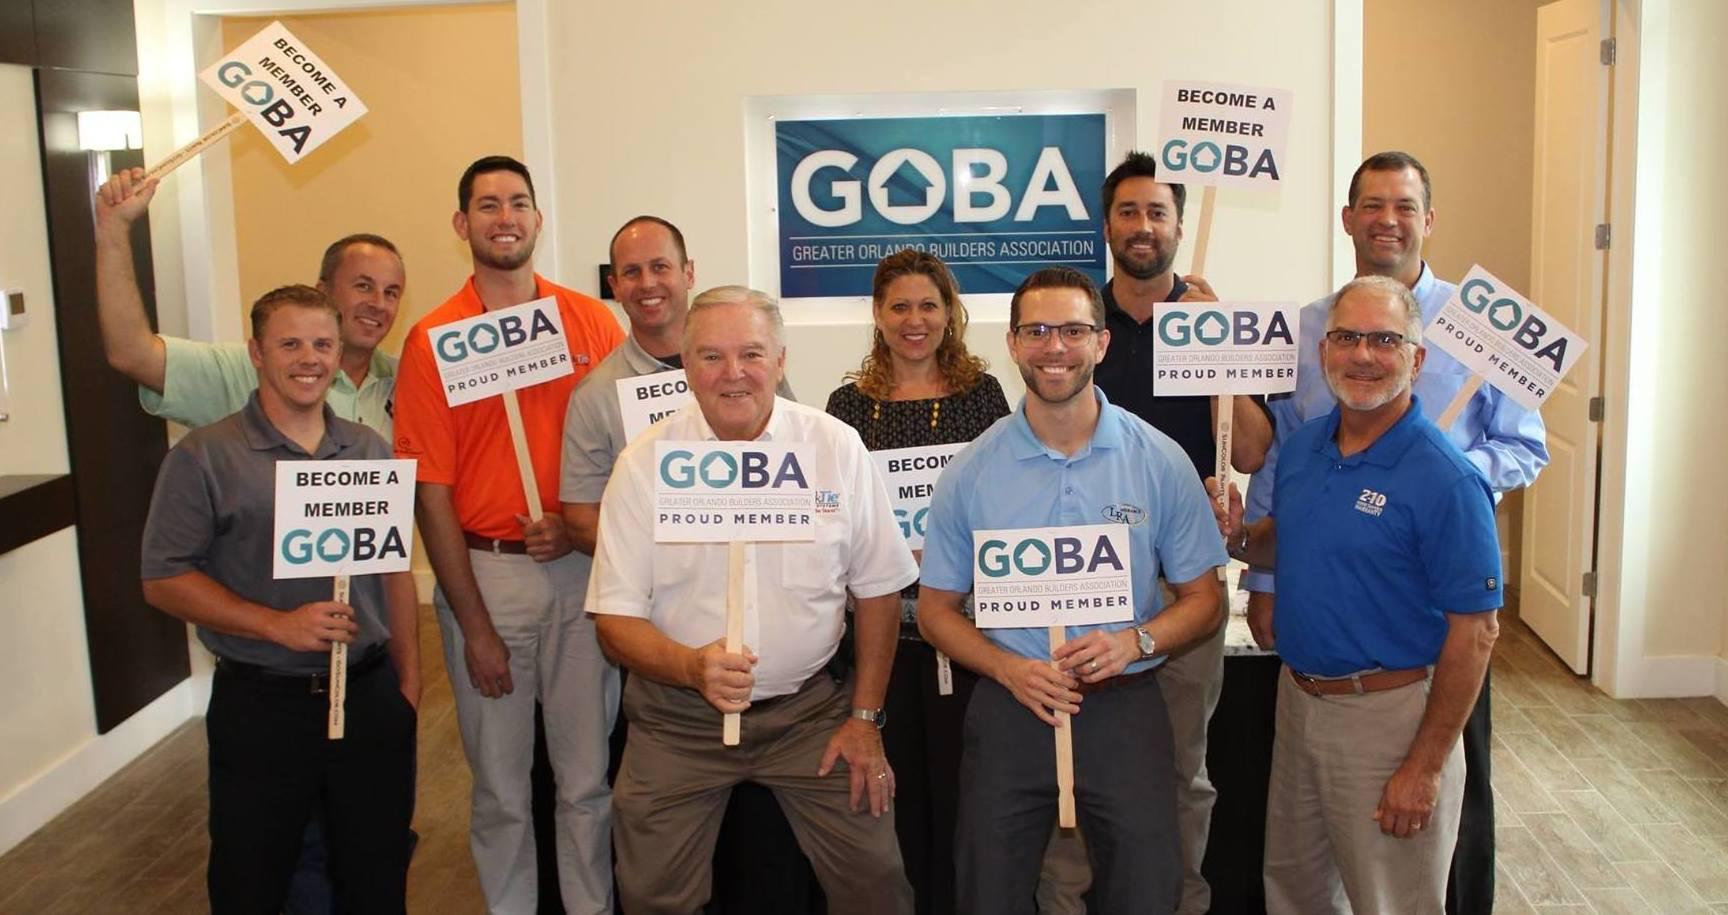 GOBA-Become-a-Member-w2045-w1728.jpg